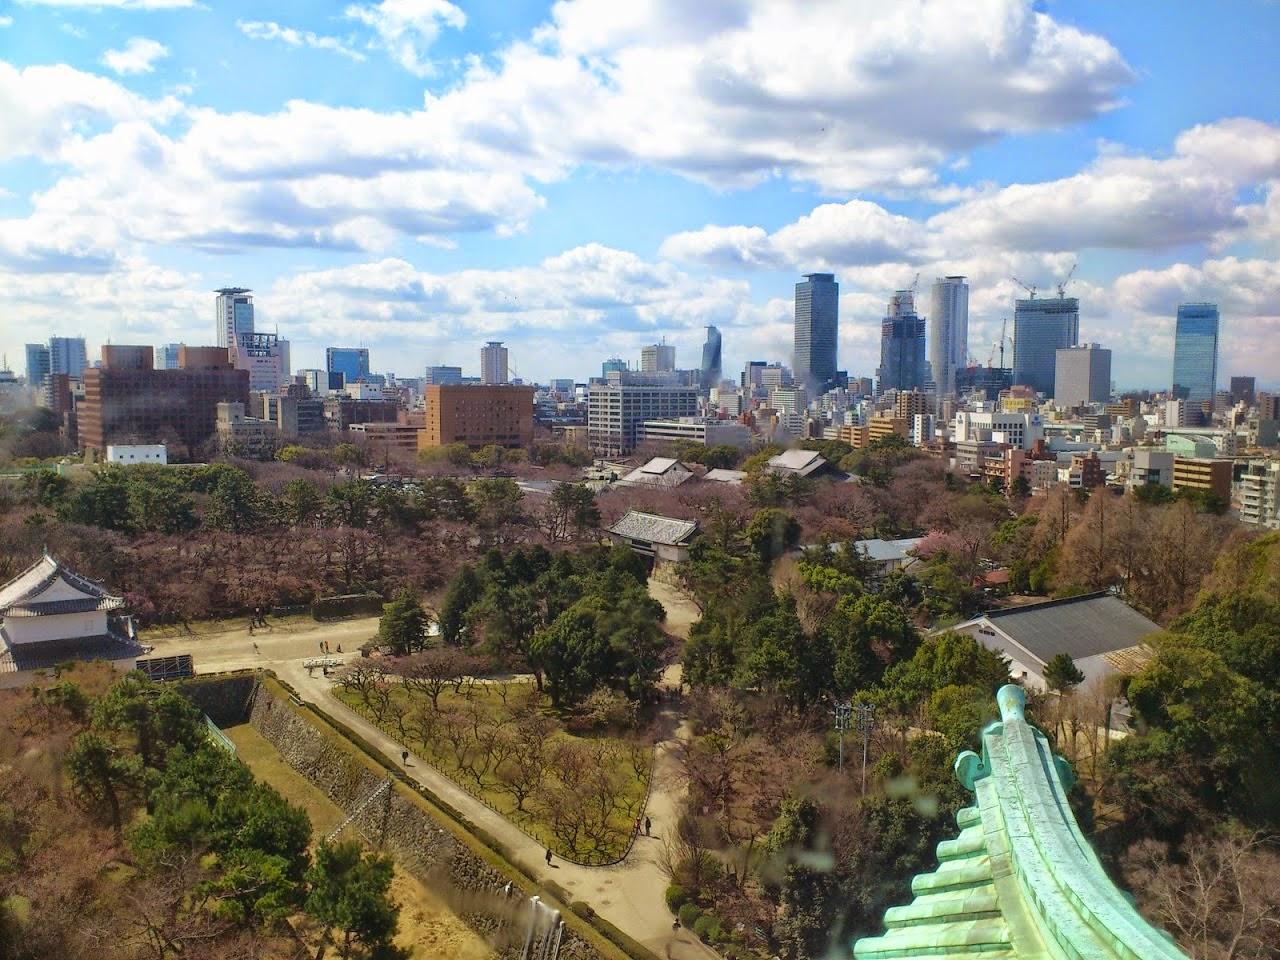 Japanisches Dach schüleraustausch in 2015 16